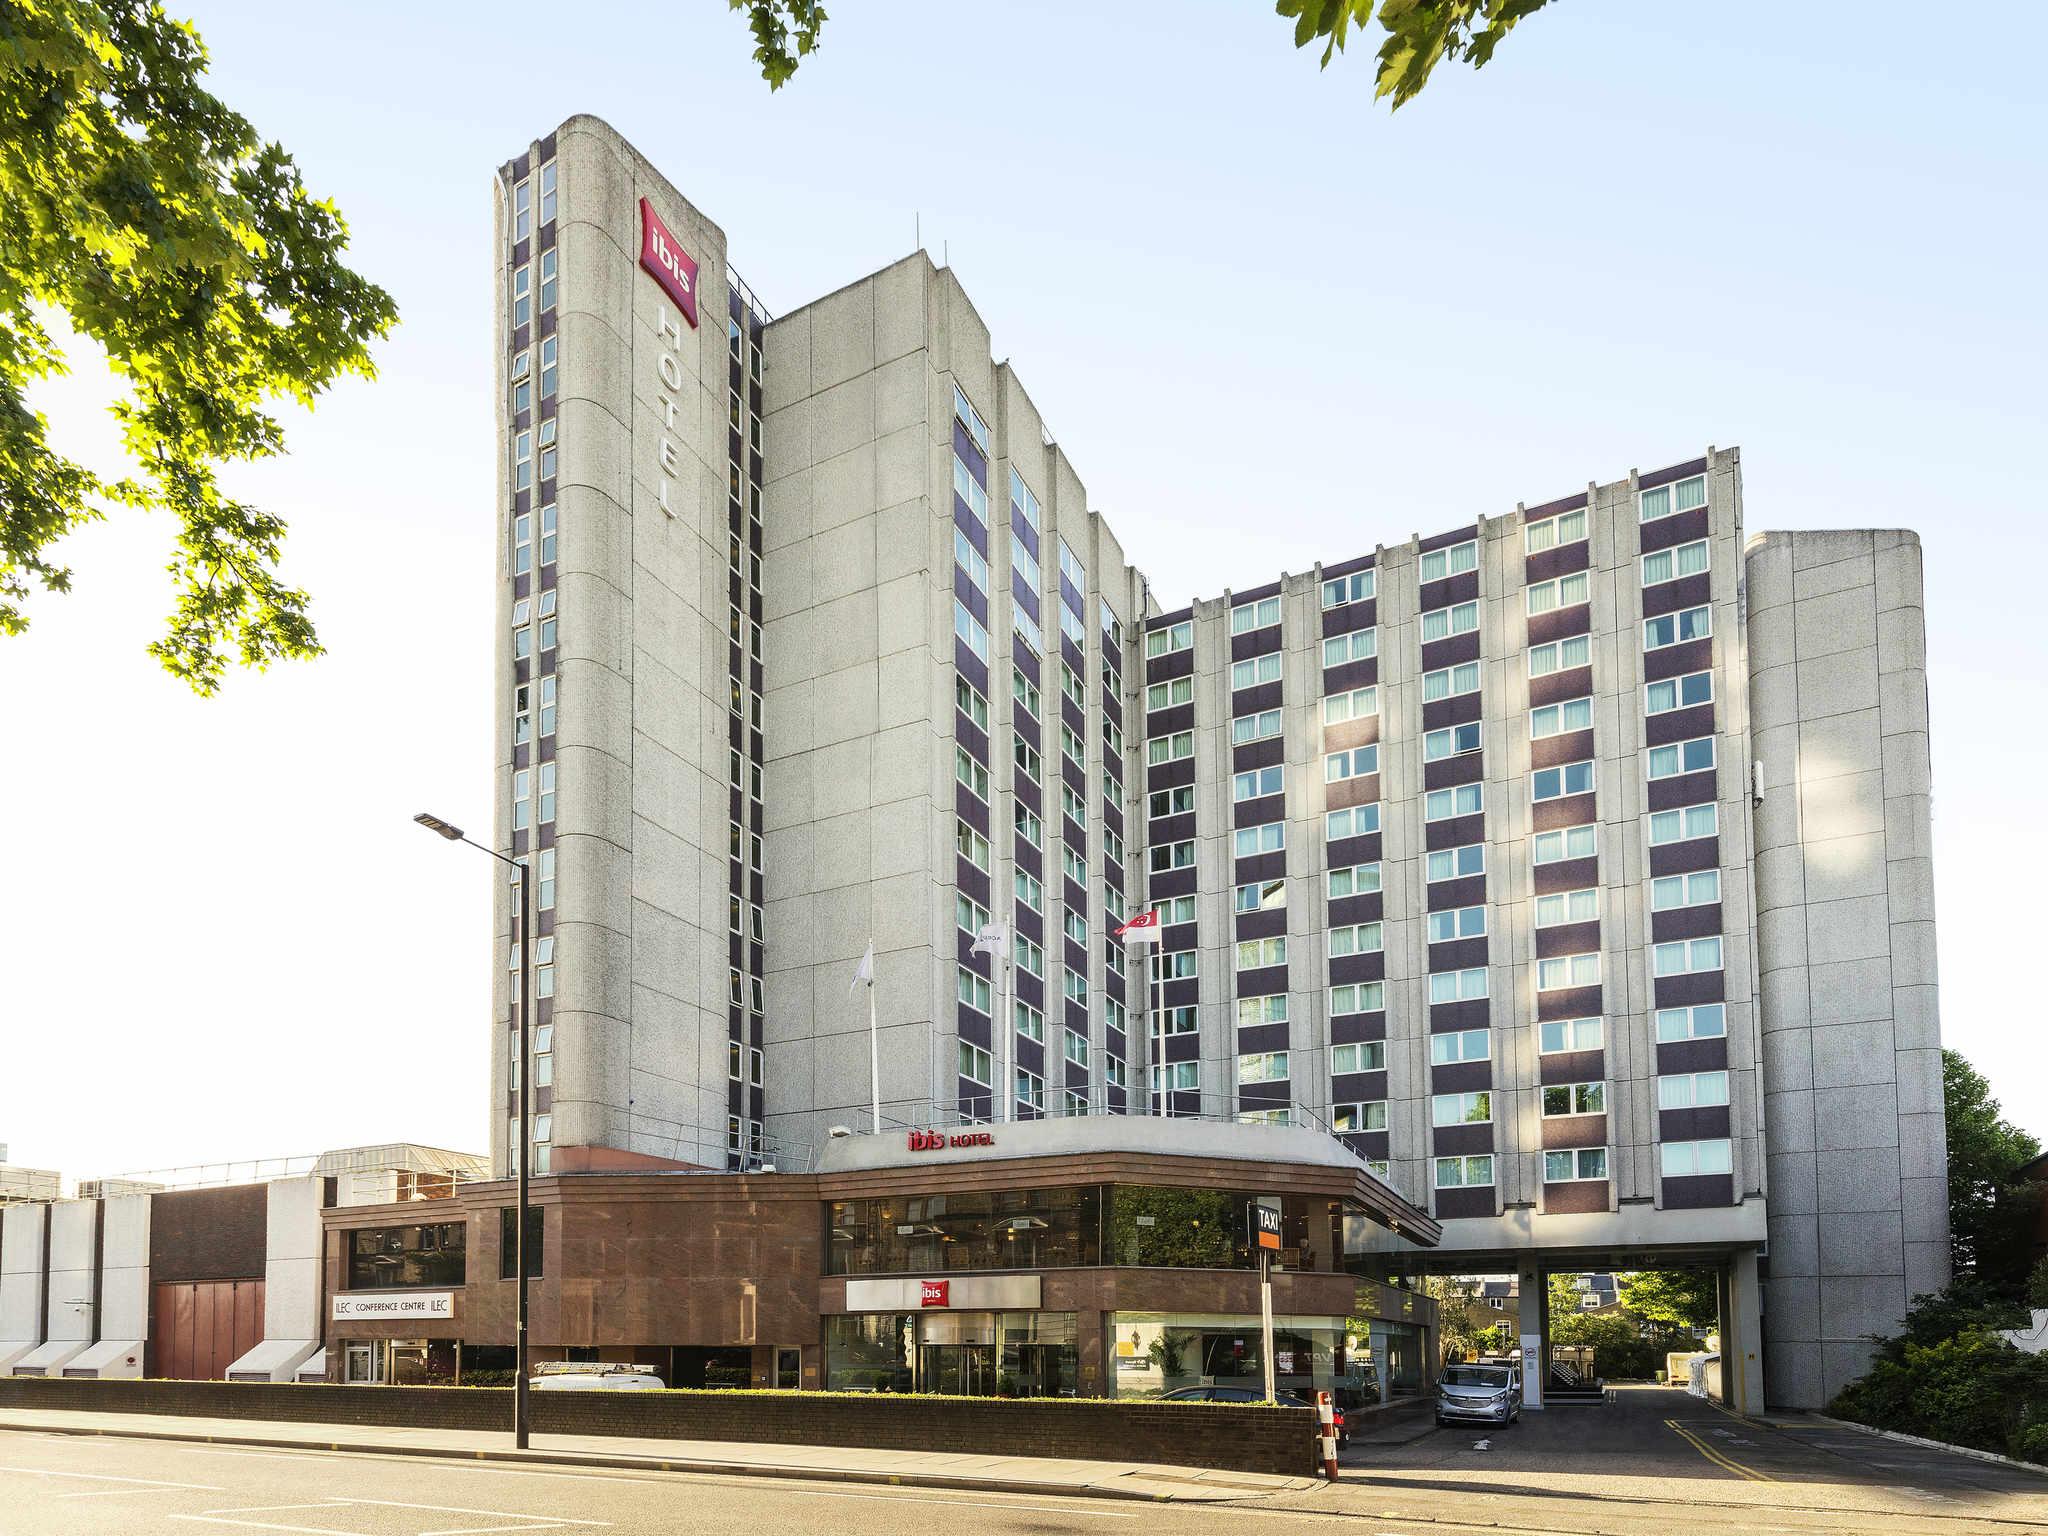 Hotel Ibis London Earls Court